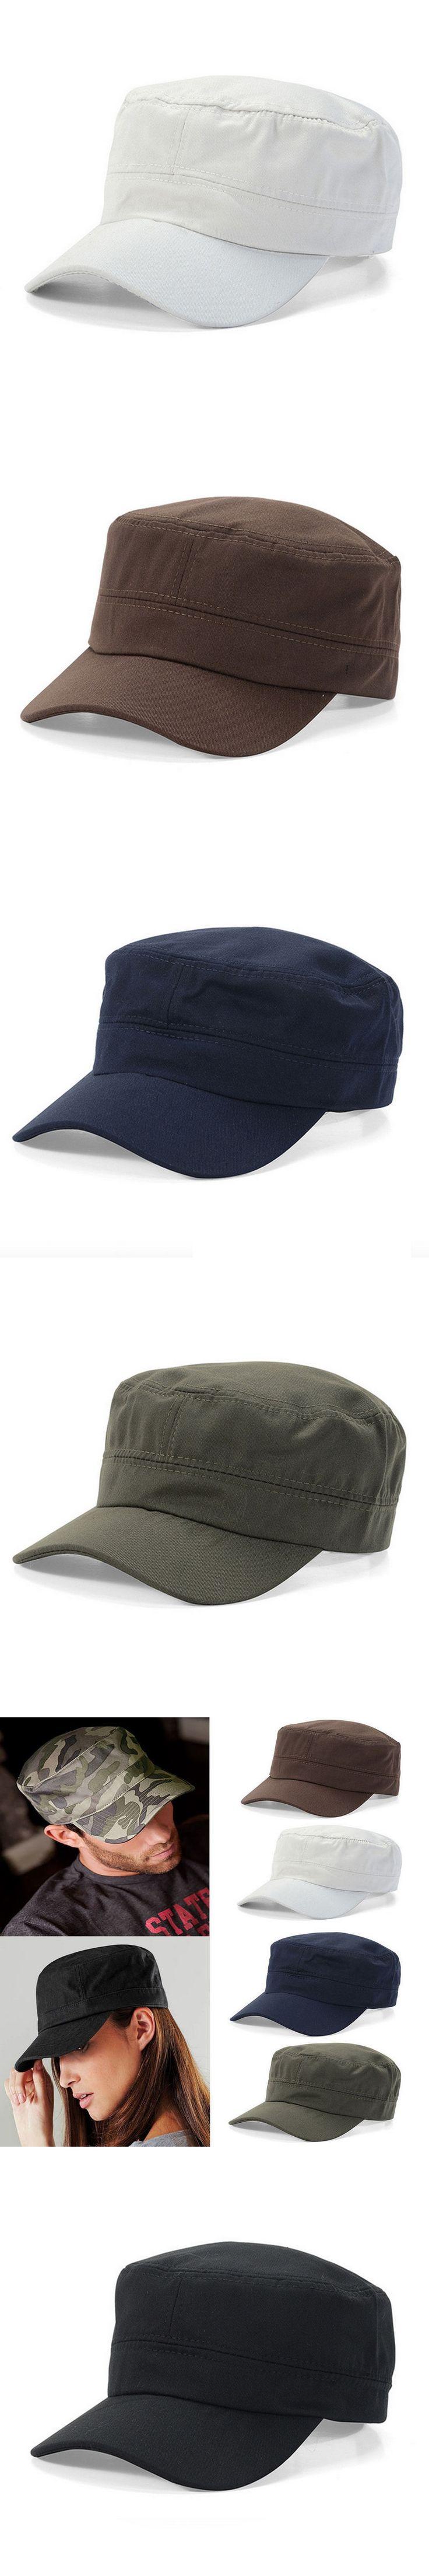 NaroFace Adjustable Women Men Snapback Caps Vintage Army Hat Cadet Military Cap Gorras Baseball Unisex Sun Hats 5colors